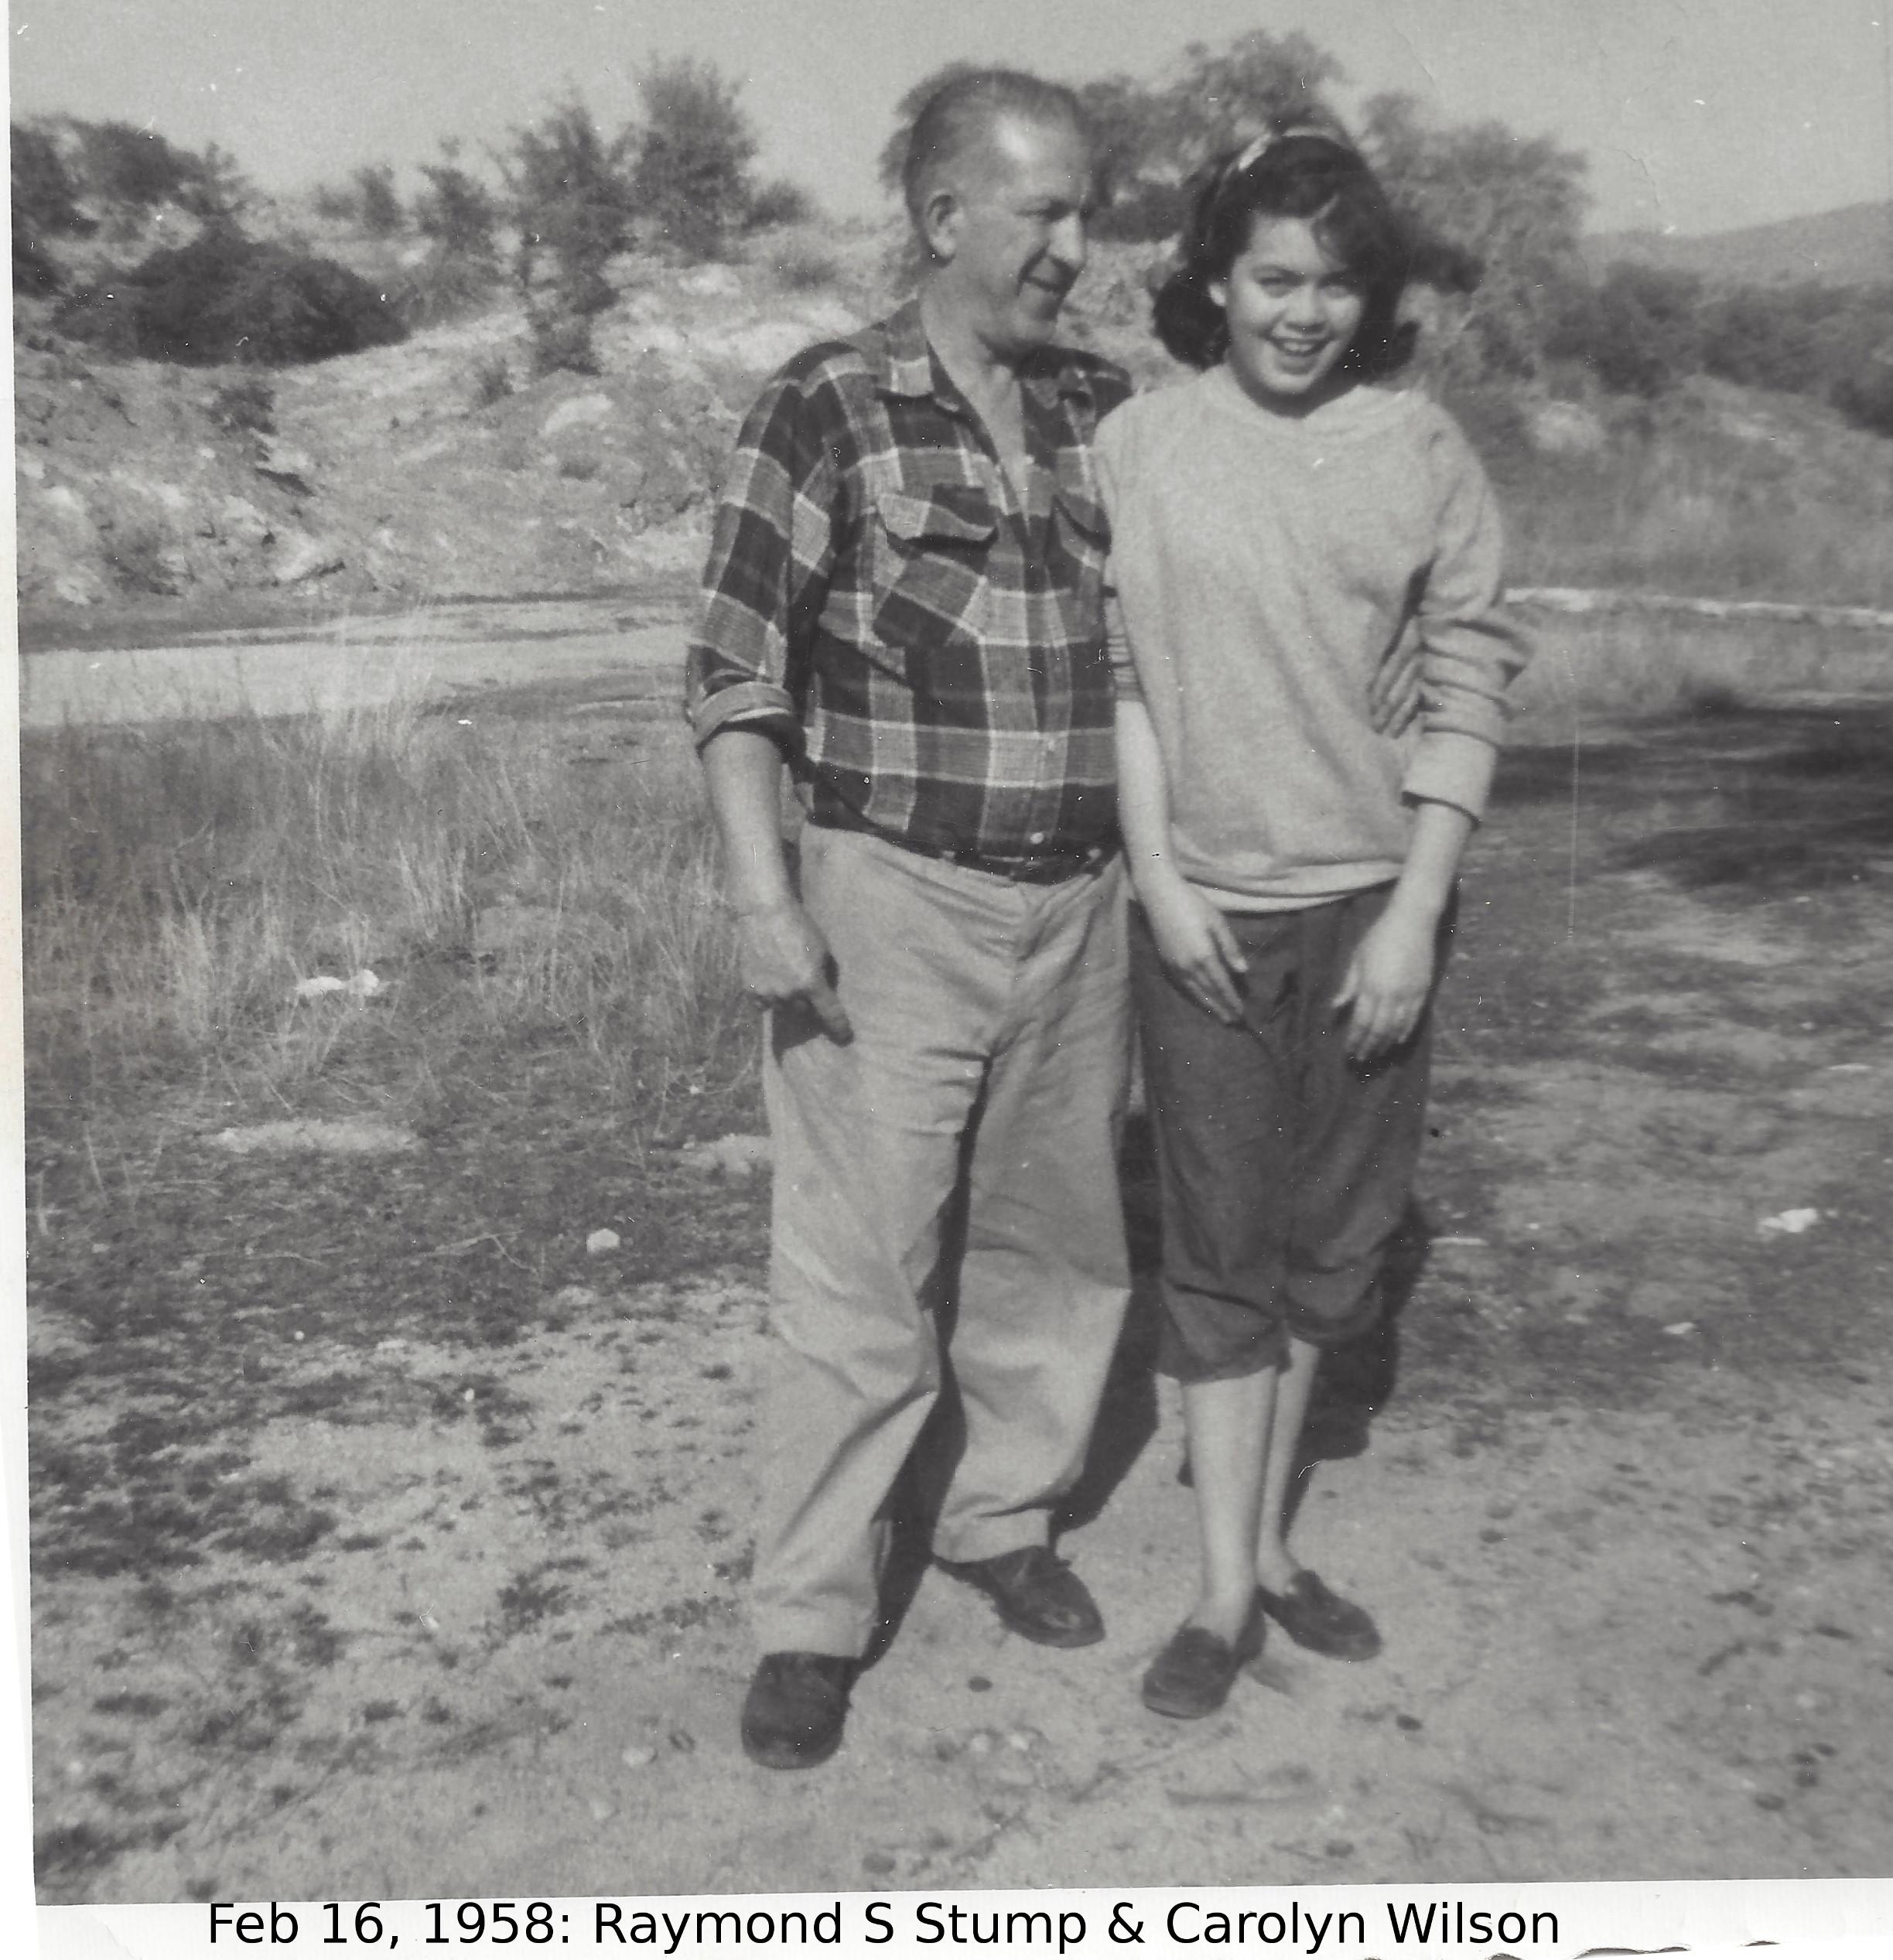 Raymond Stump and Carolyn Wilson